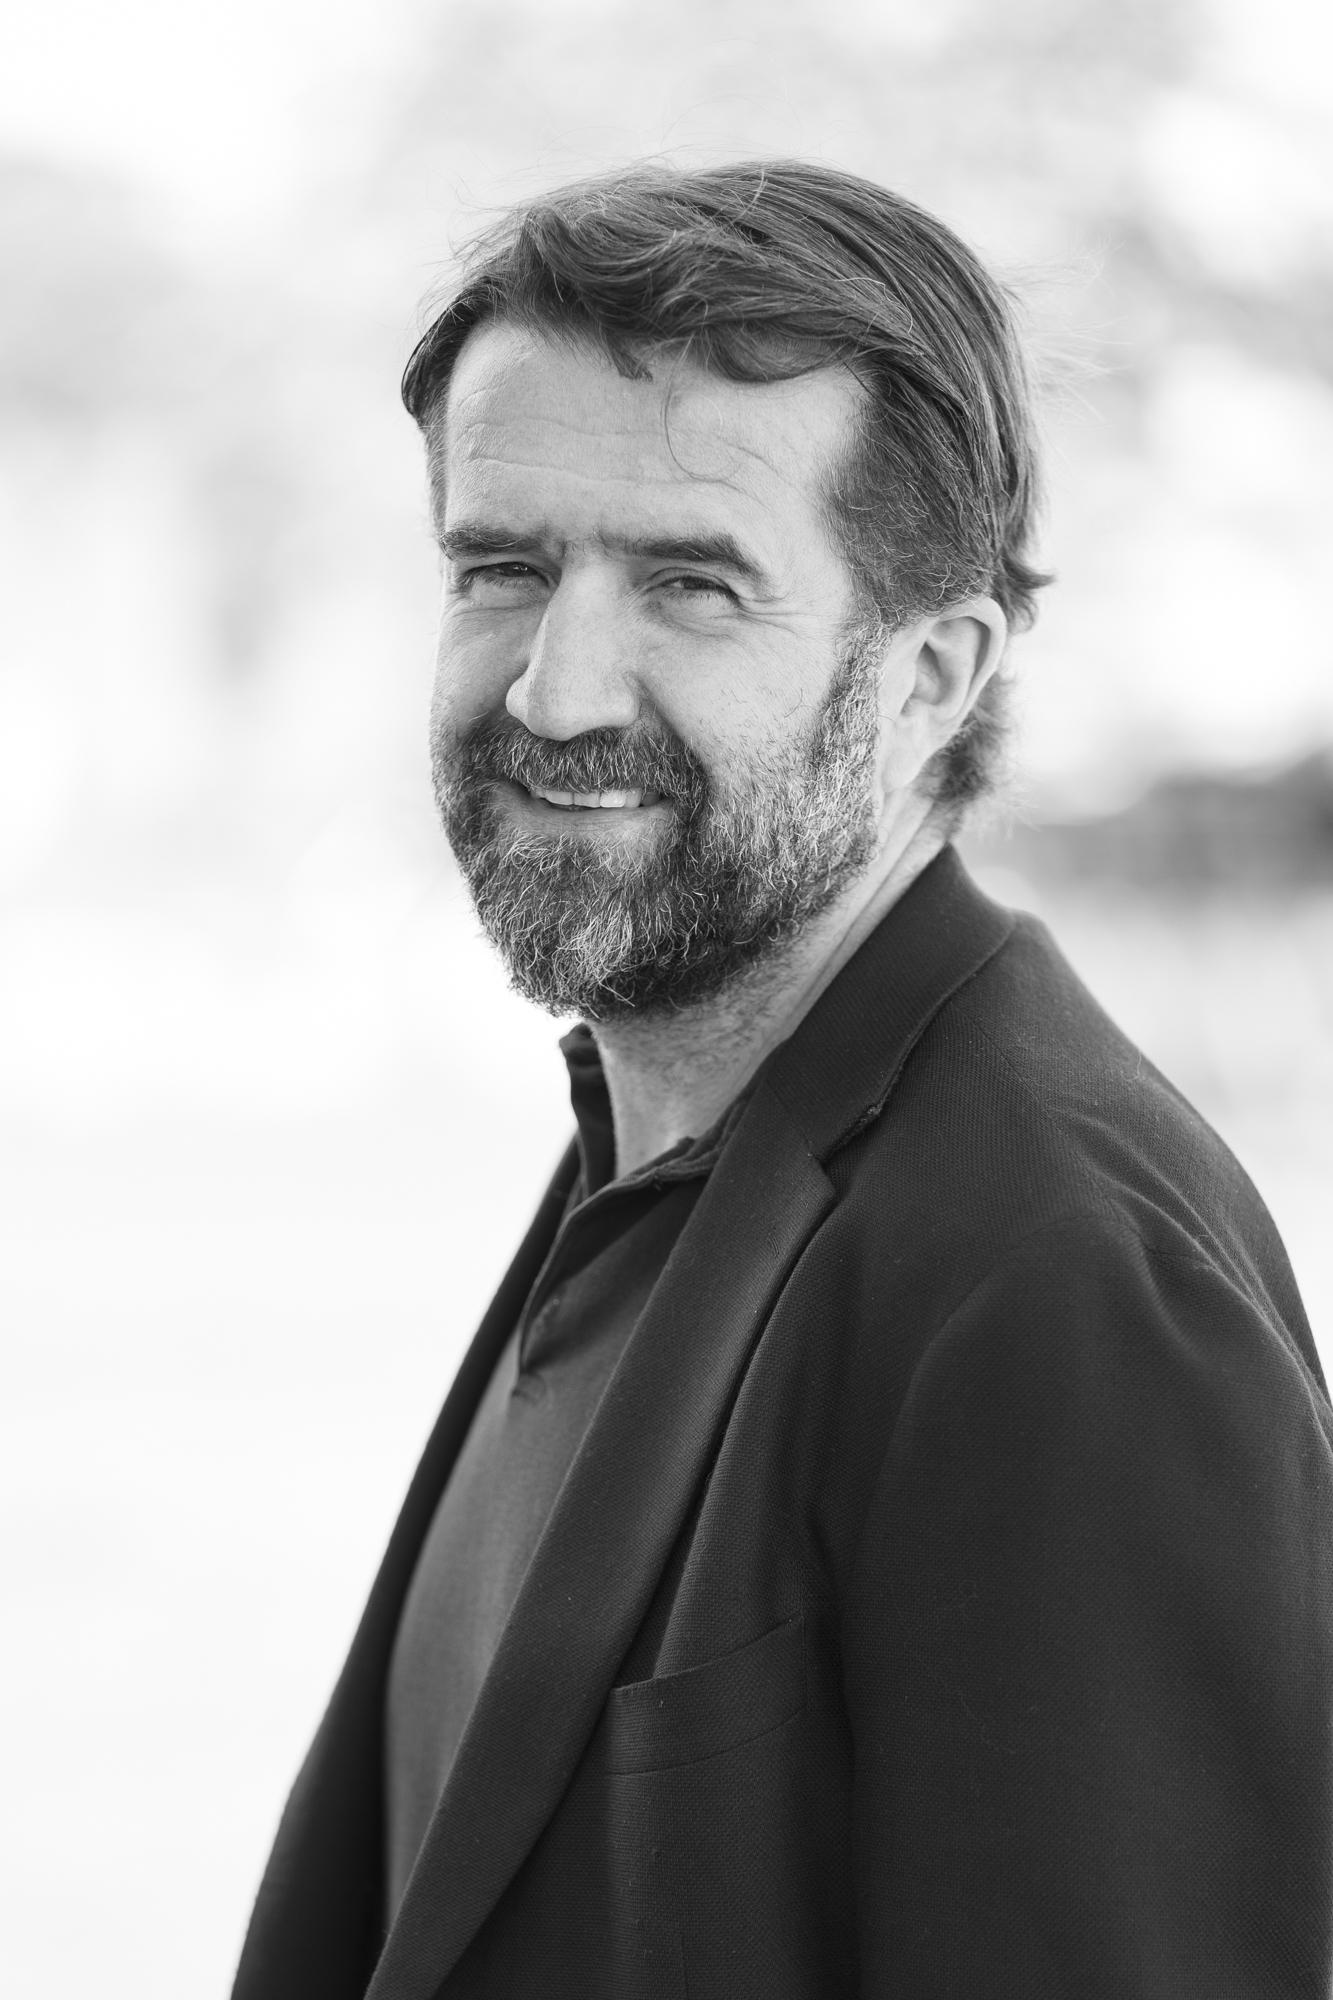 Lars Traaholt